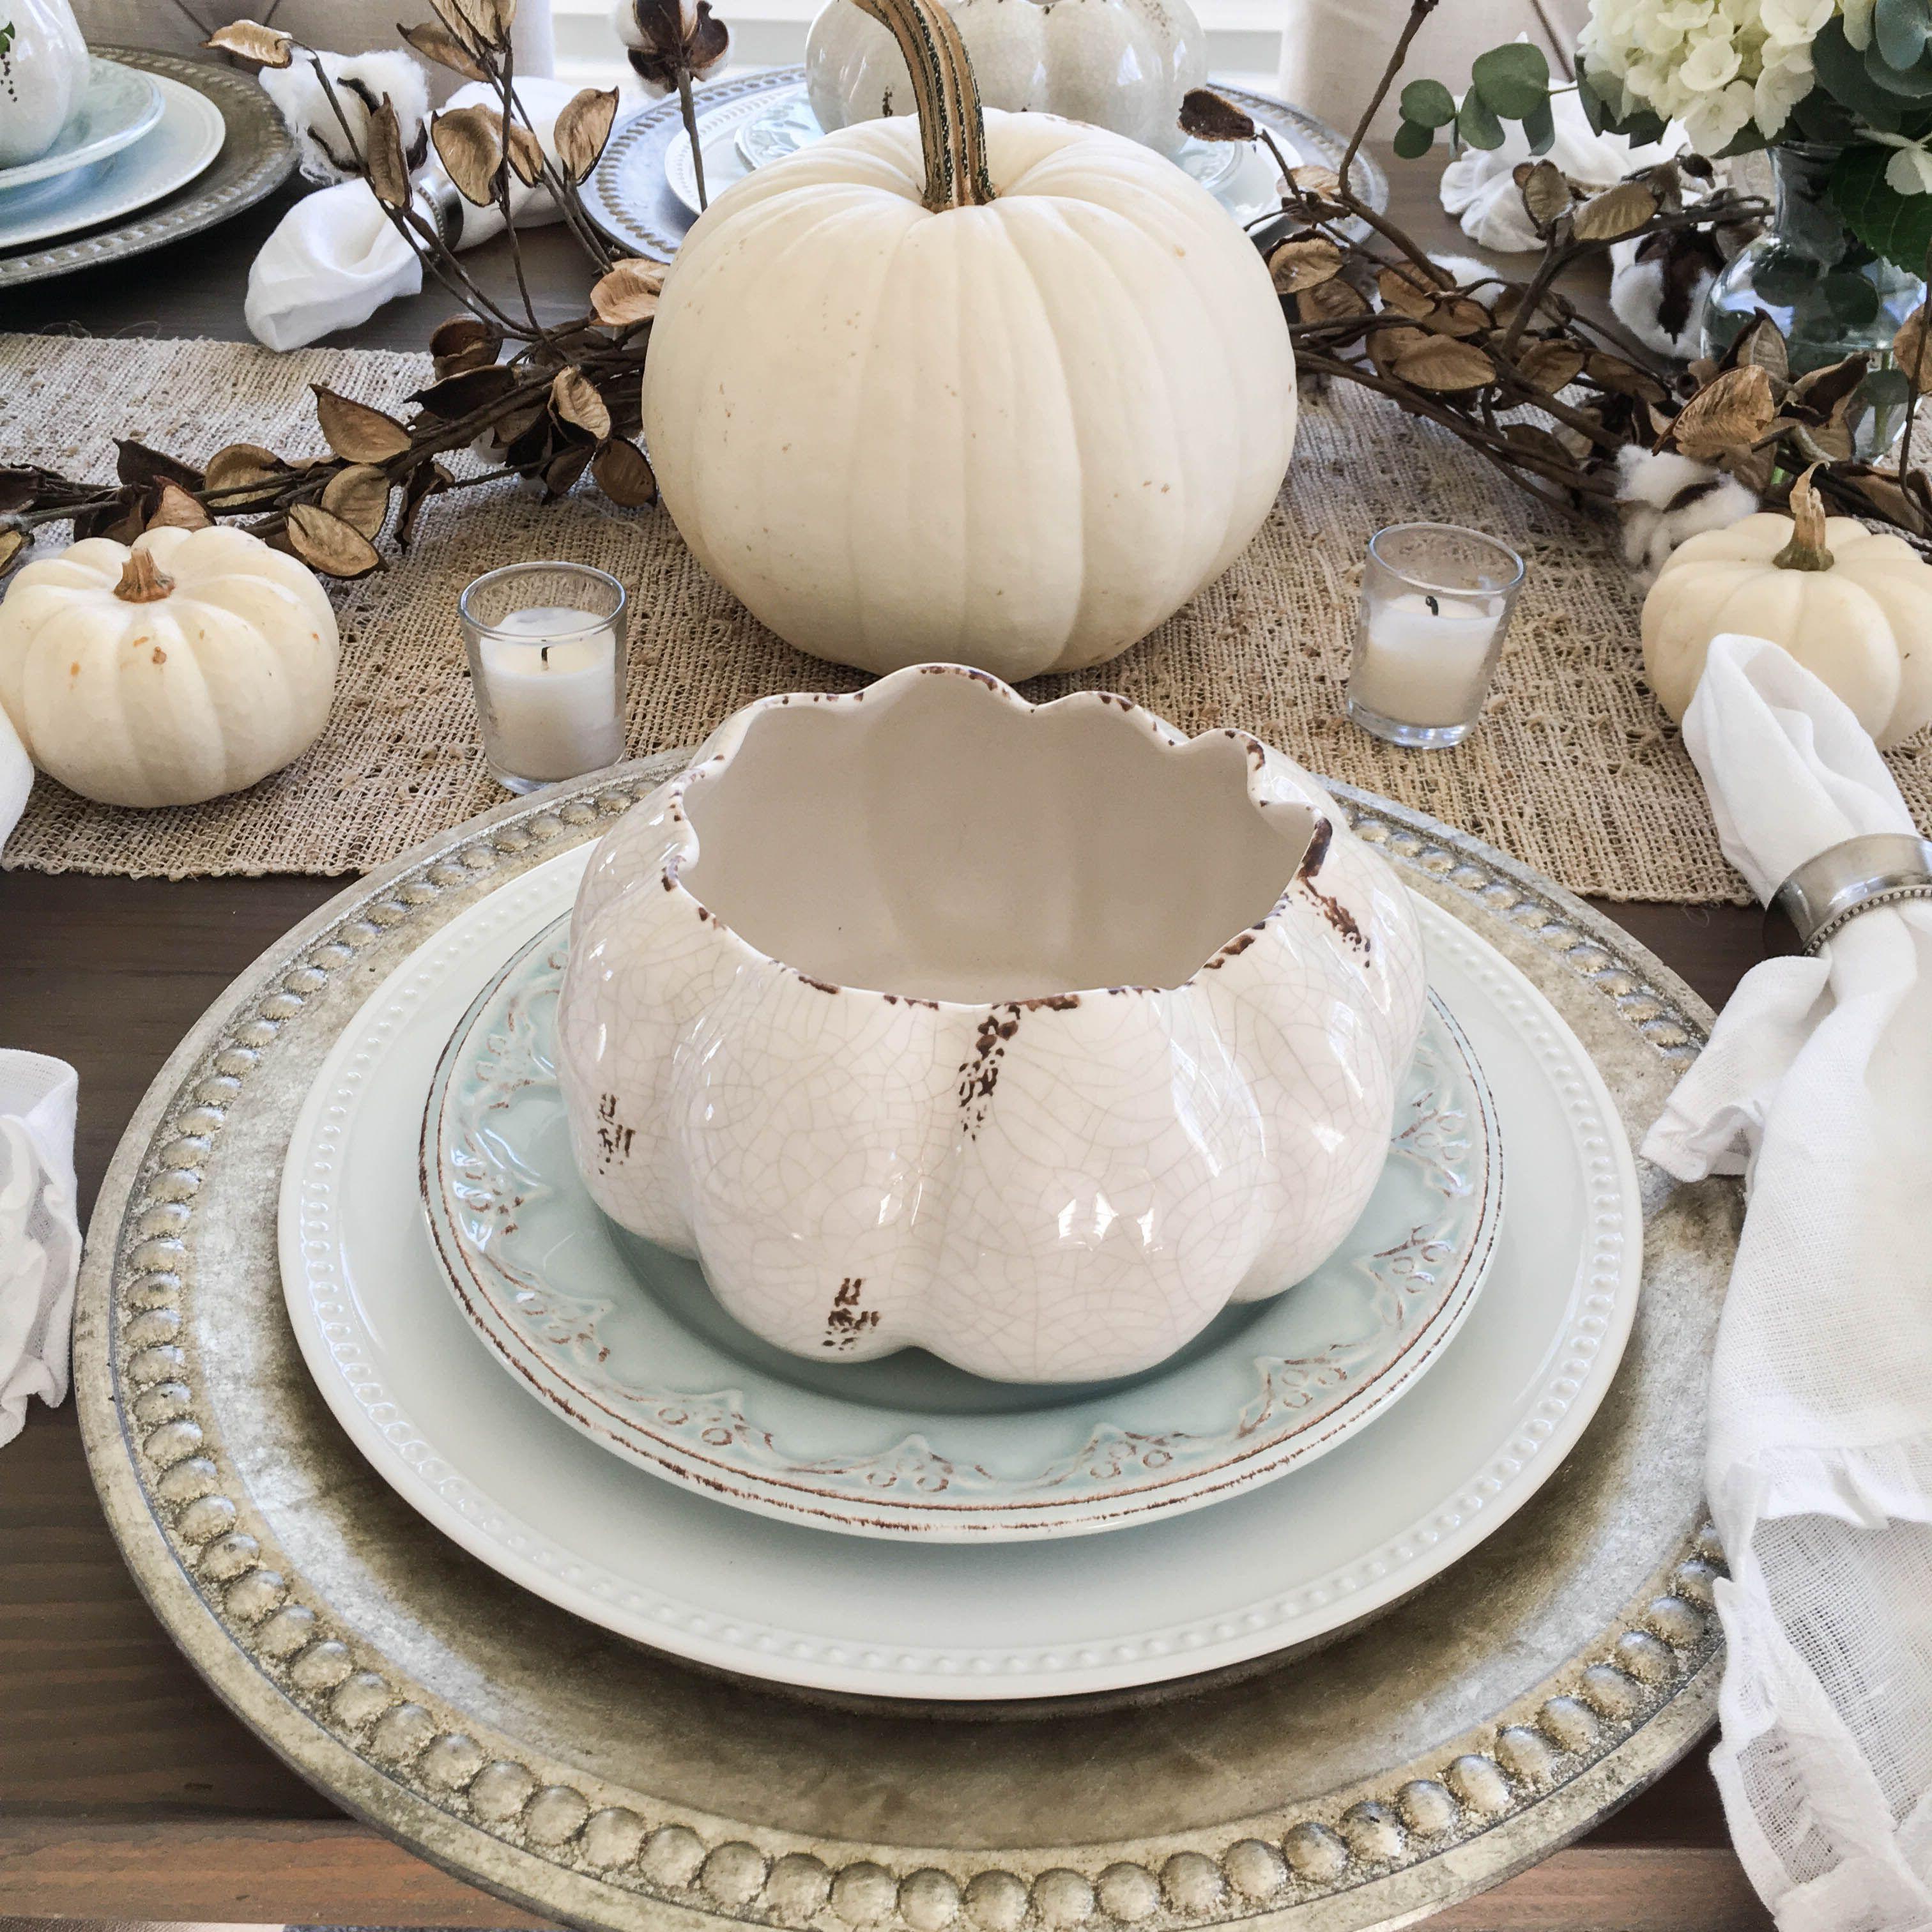 Blogger Ashley Pletcher Shares How To Host A Pumpkin